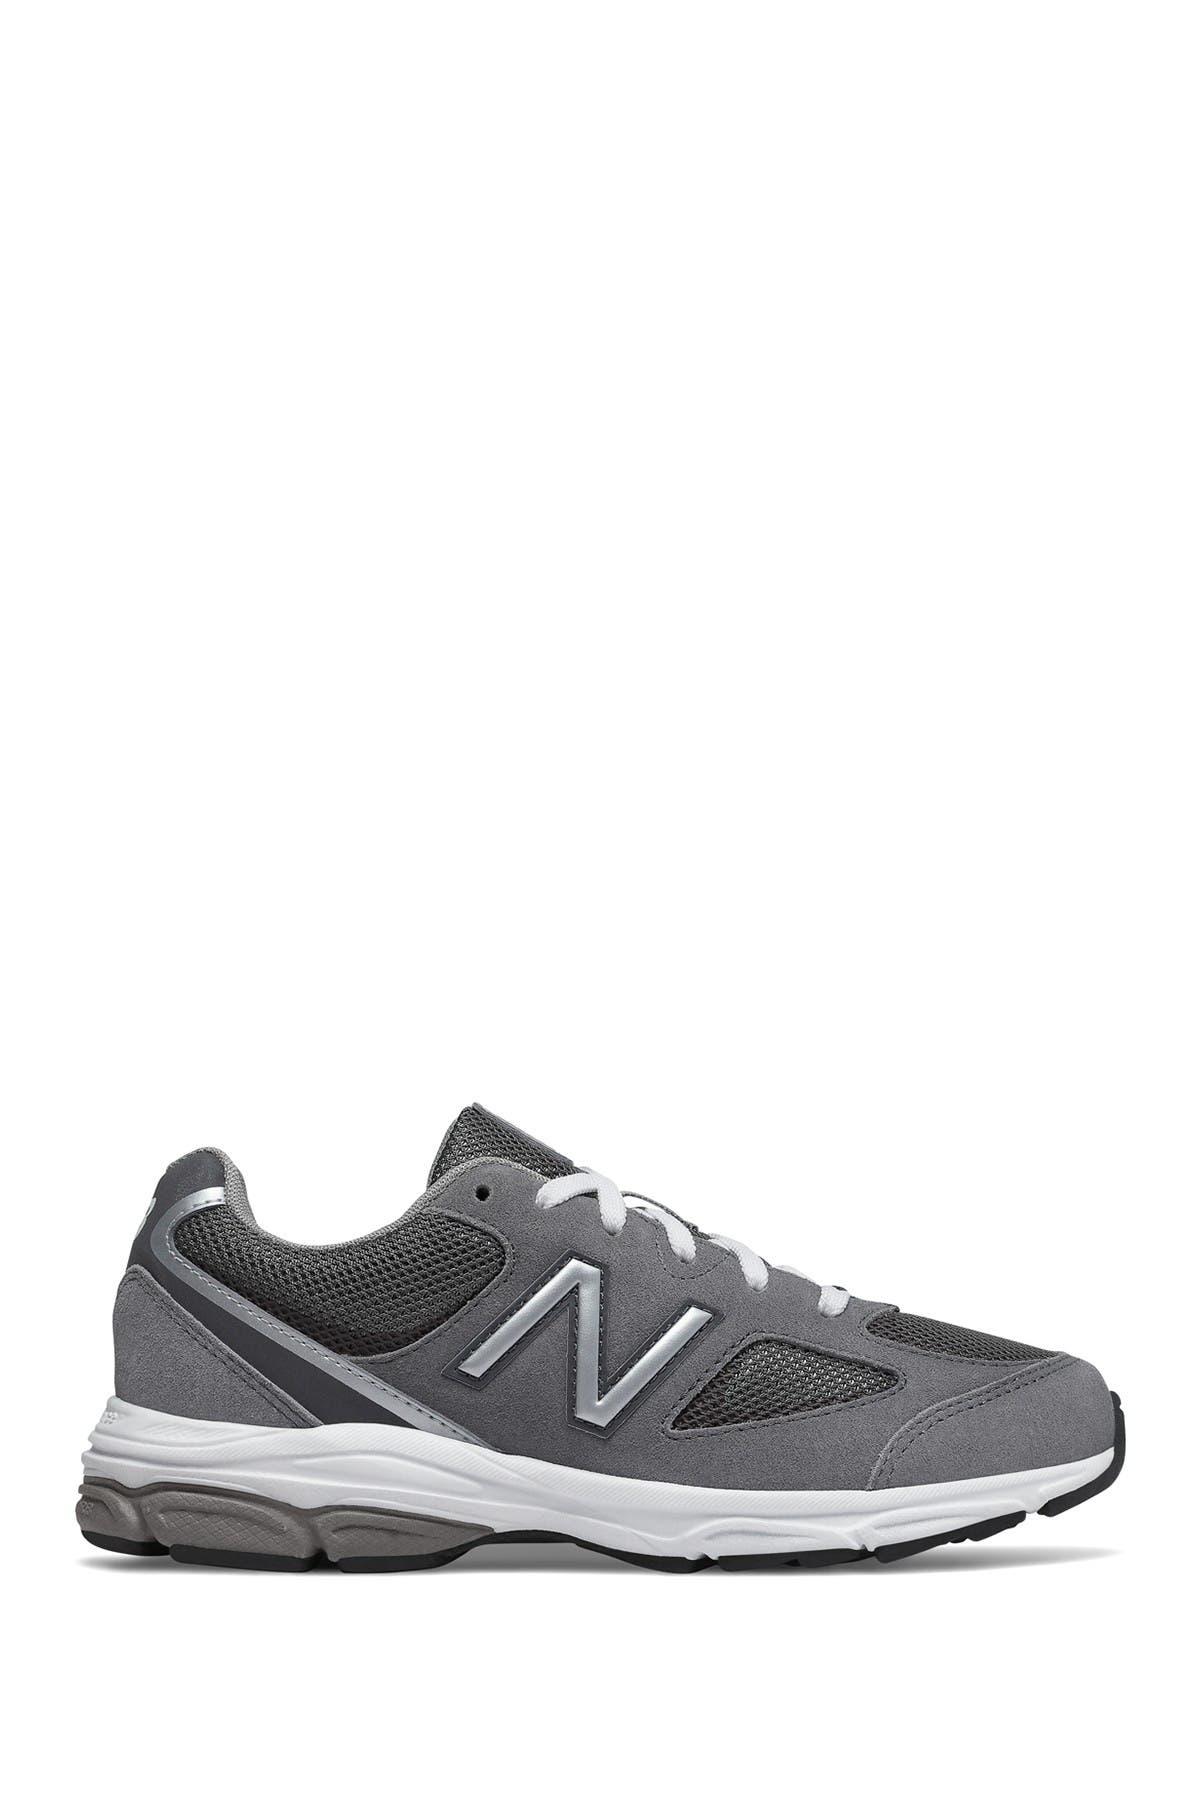 Image of New Balance 888 Running Sneaker